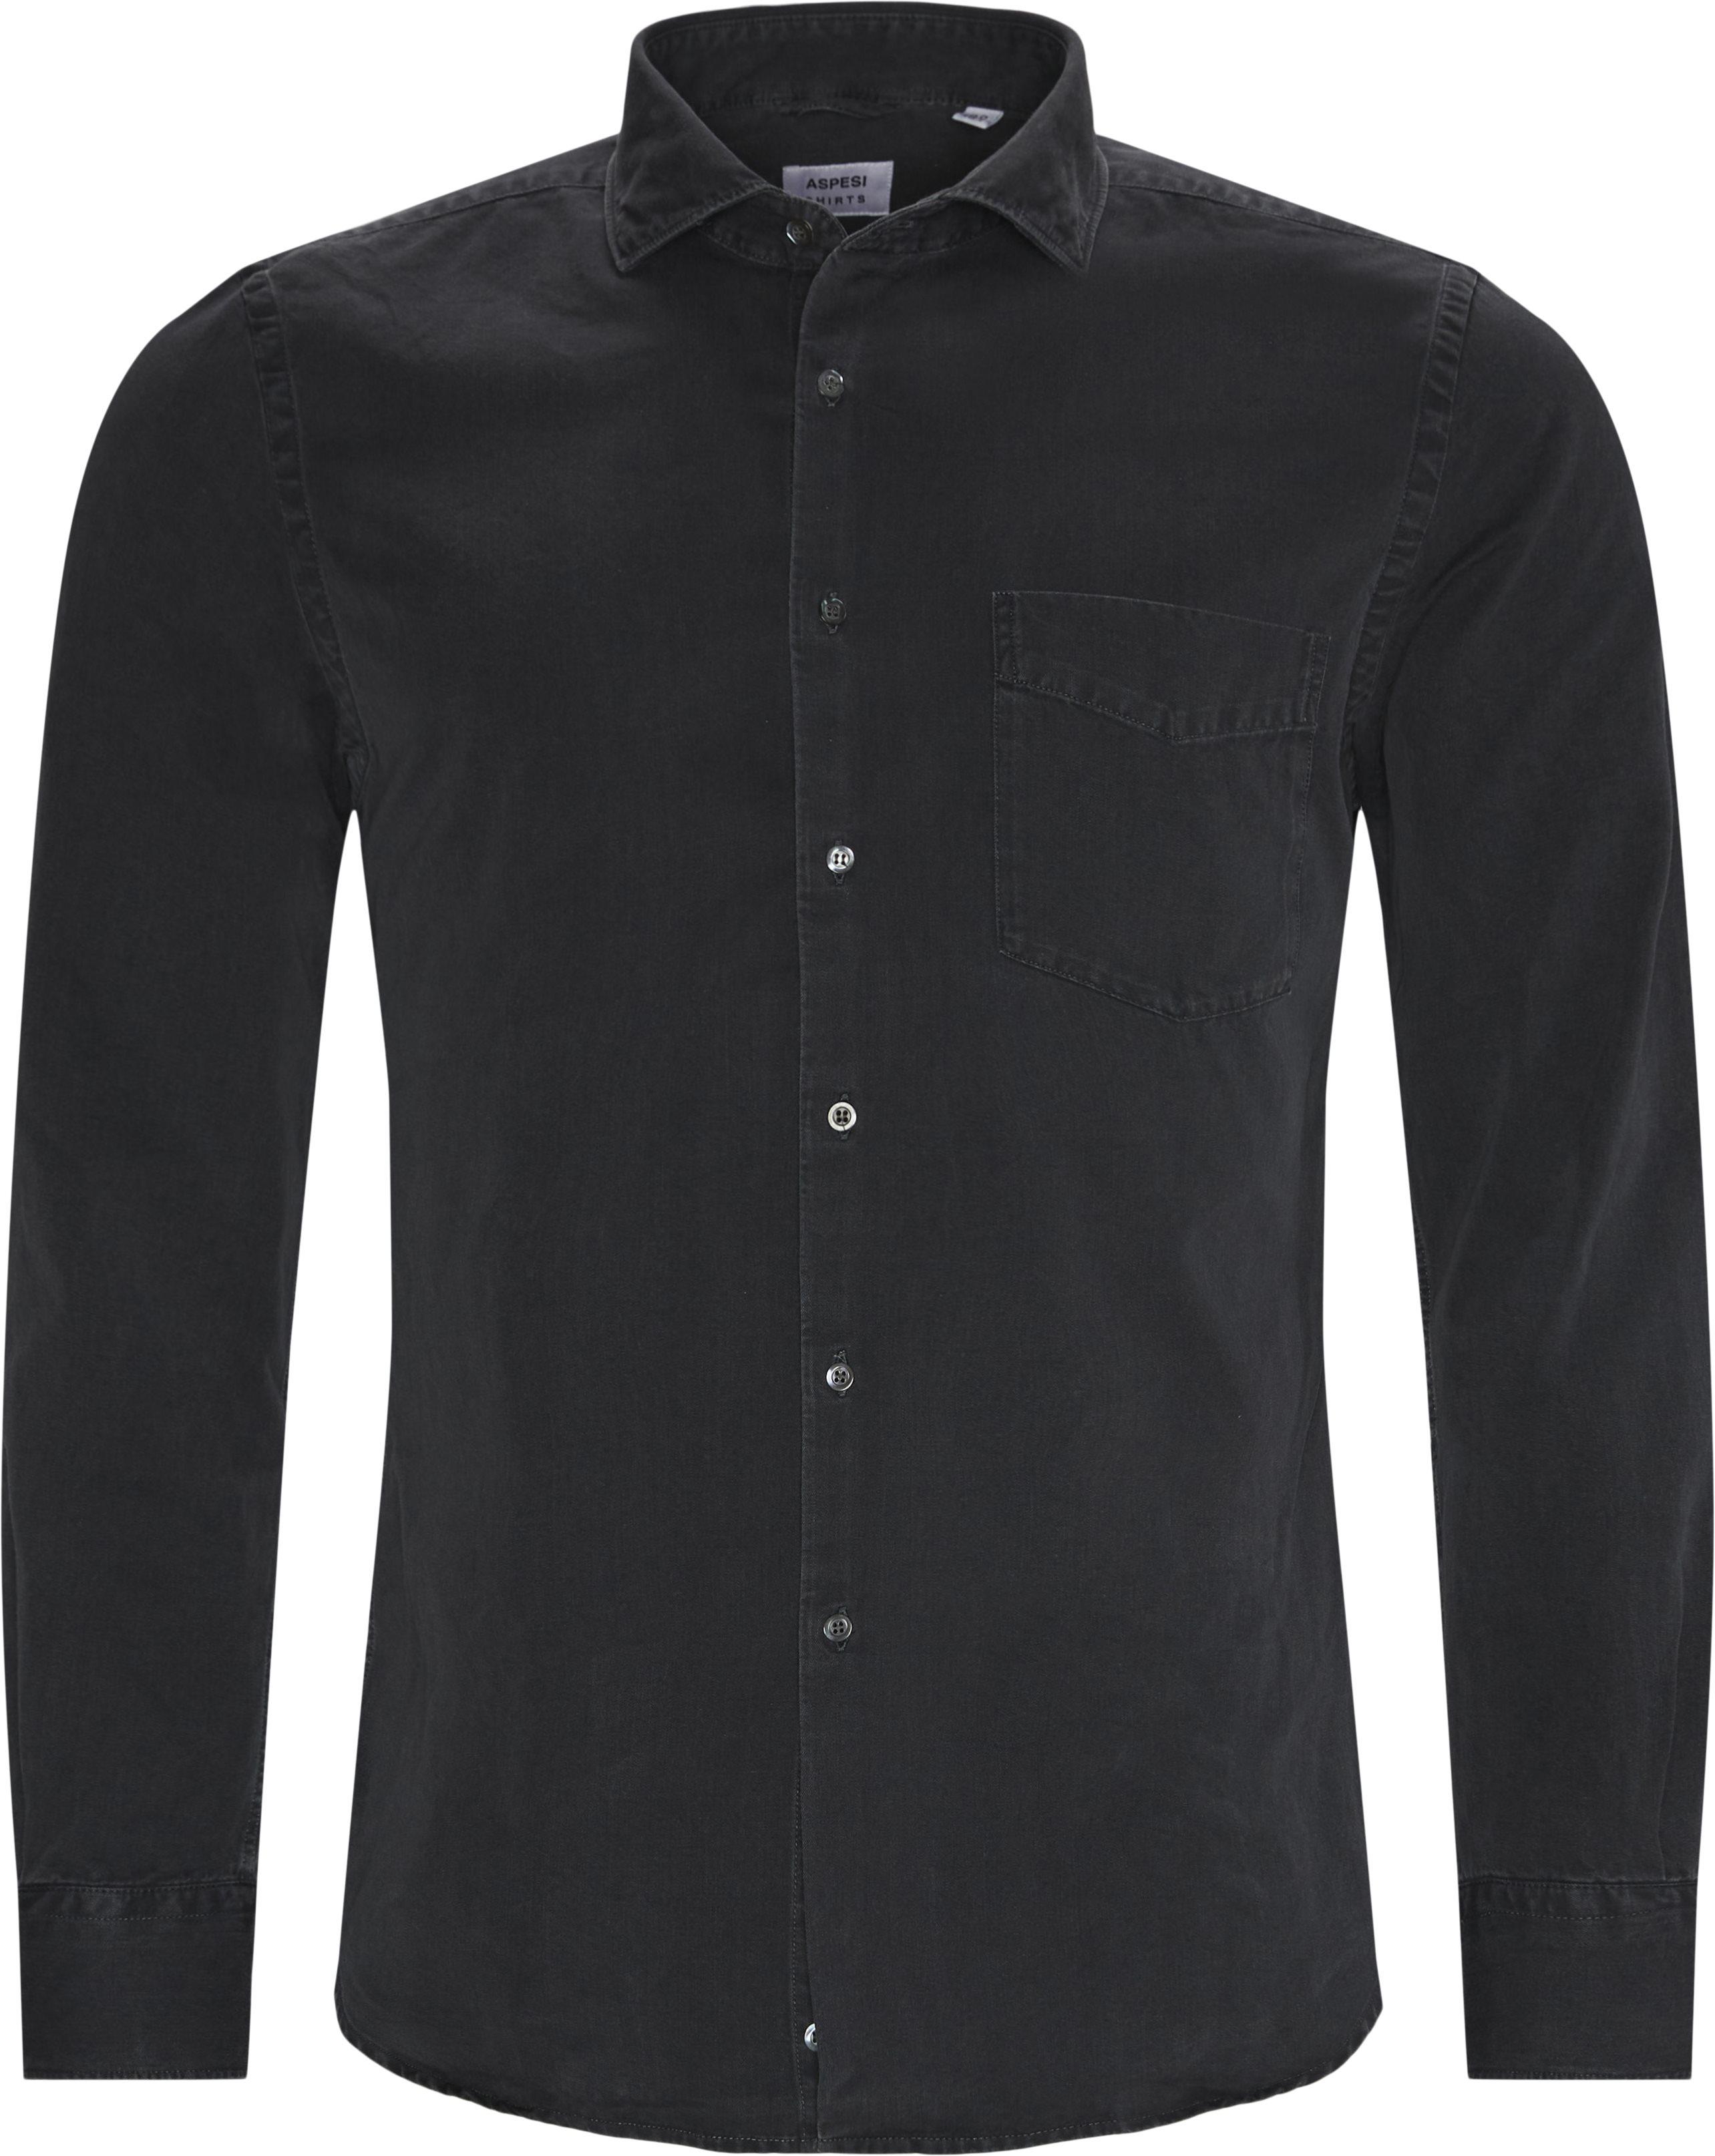 Shirts - Regular fit - Grey